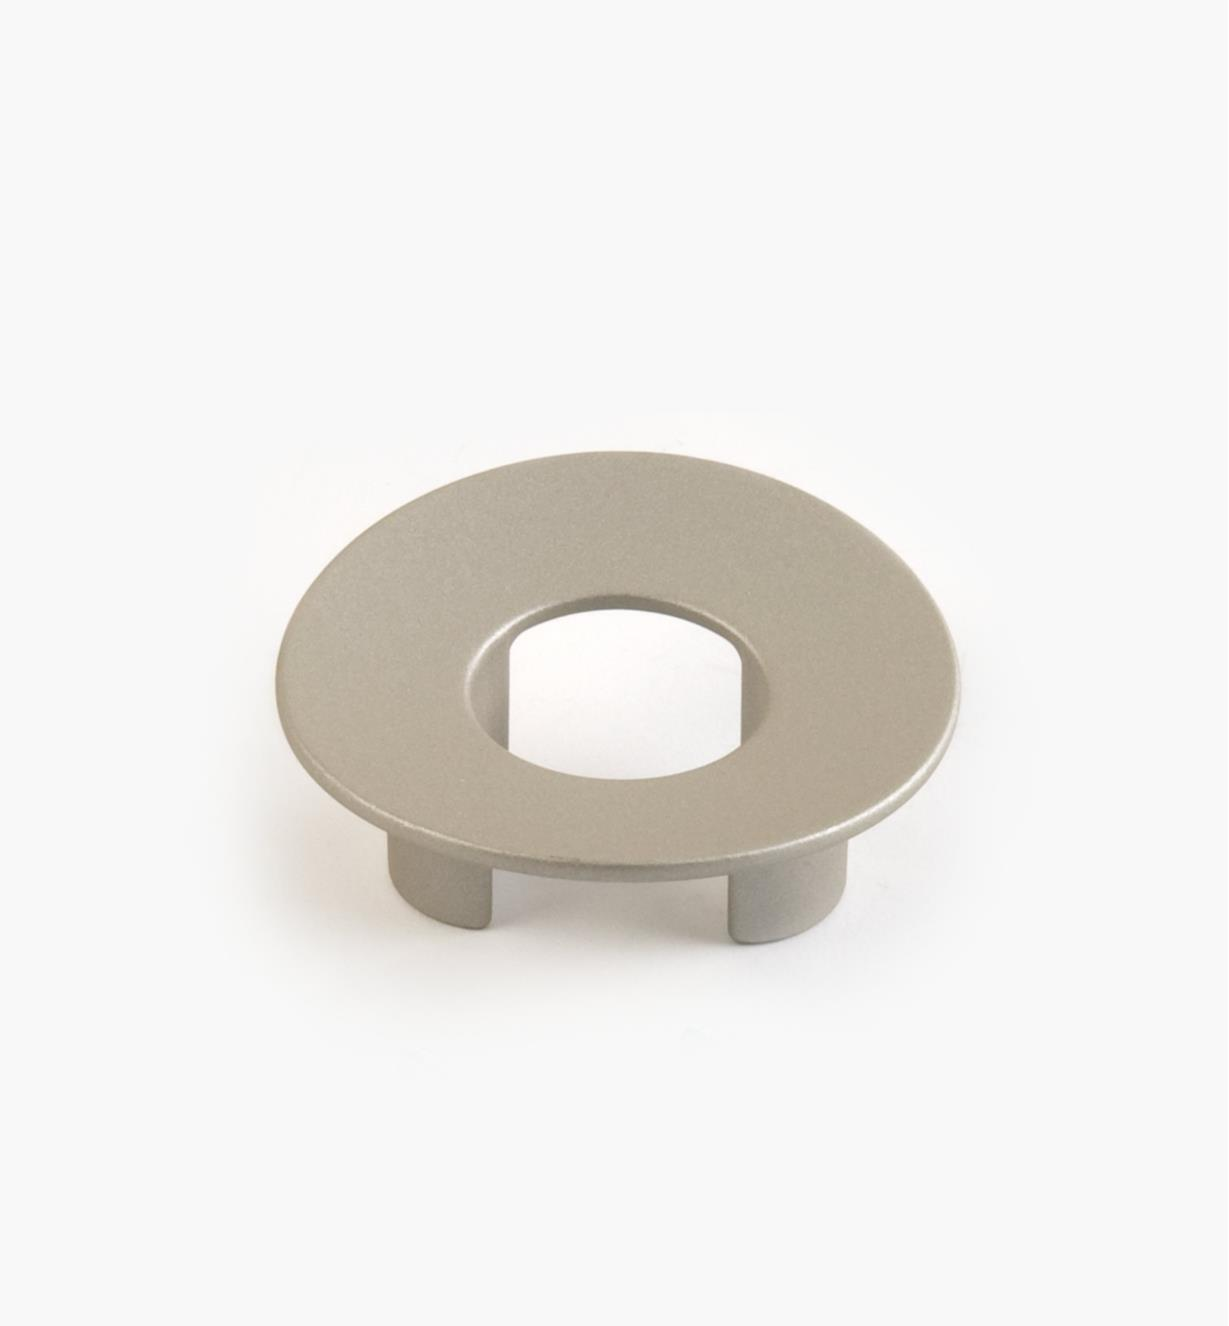 01G1633 - 32mm x 24mm Satin Nickel Round Ventana Pull